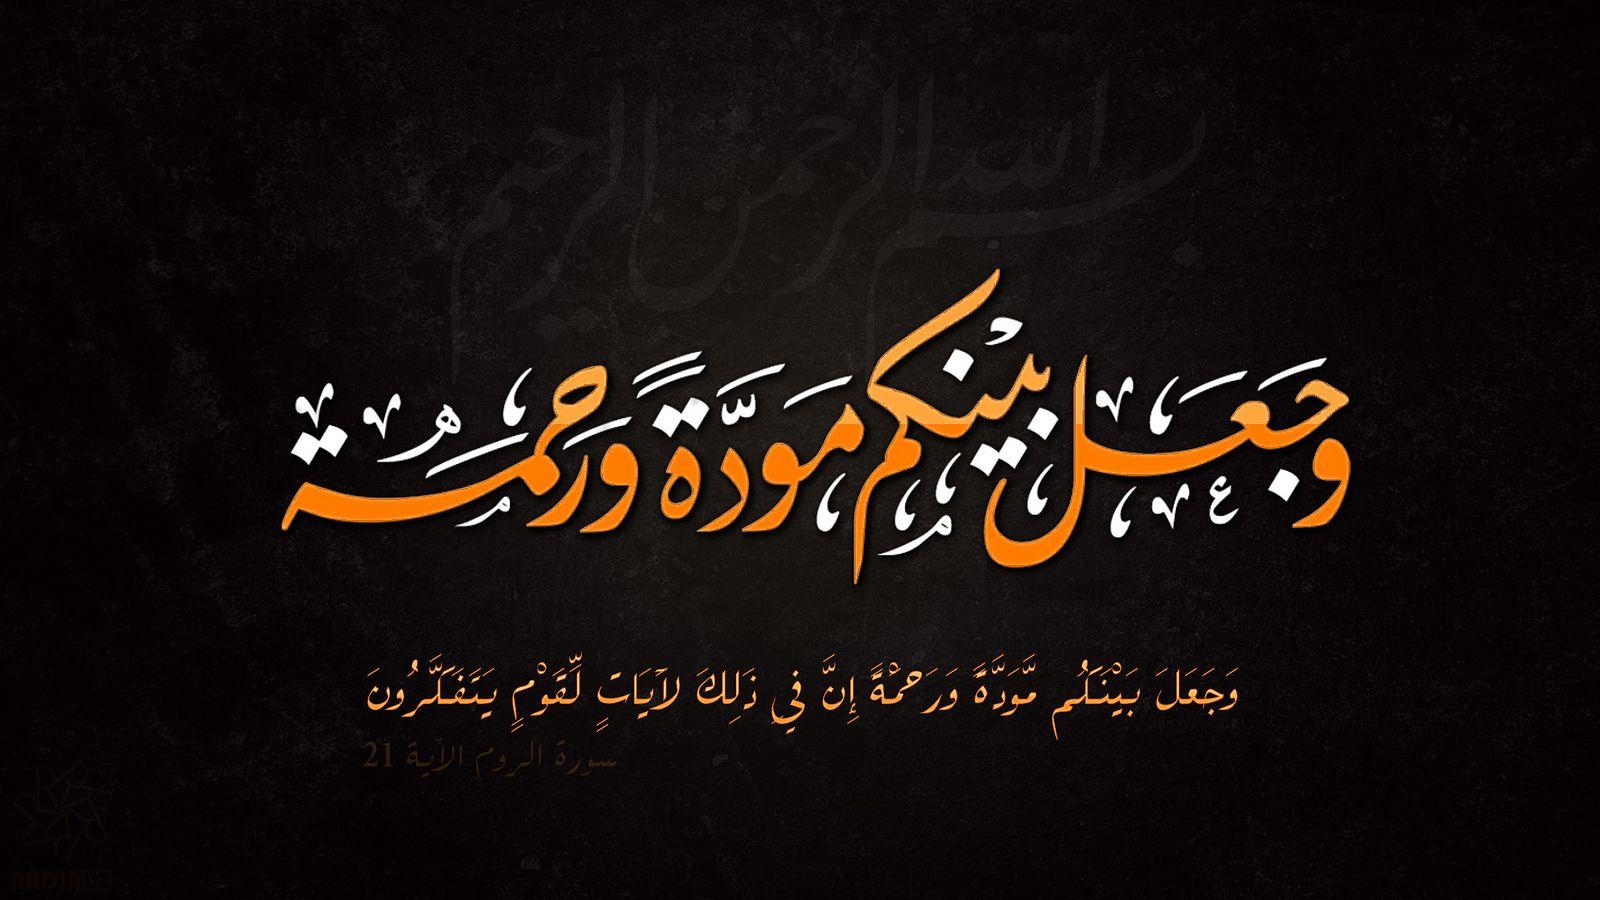 و جعل بينكم مودة و رحمة Islamic Art Calligraphy Islamic Calligraphy Arabic Art